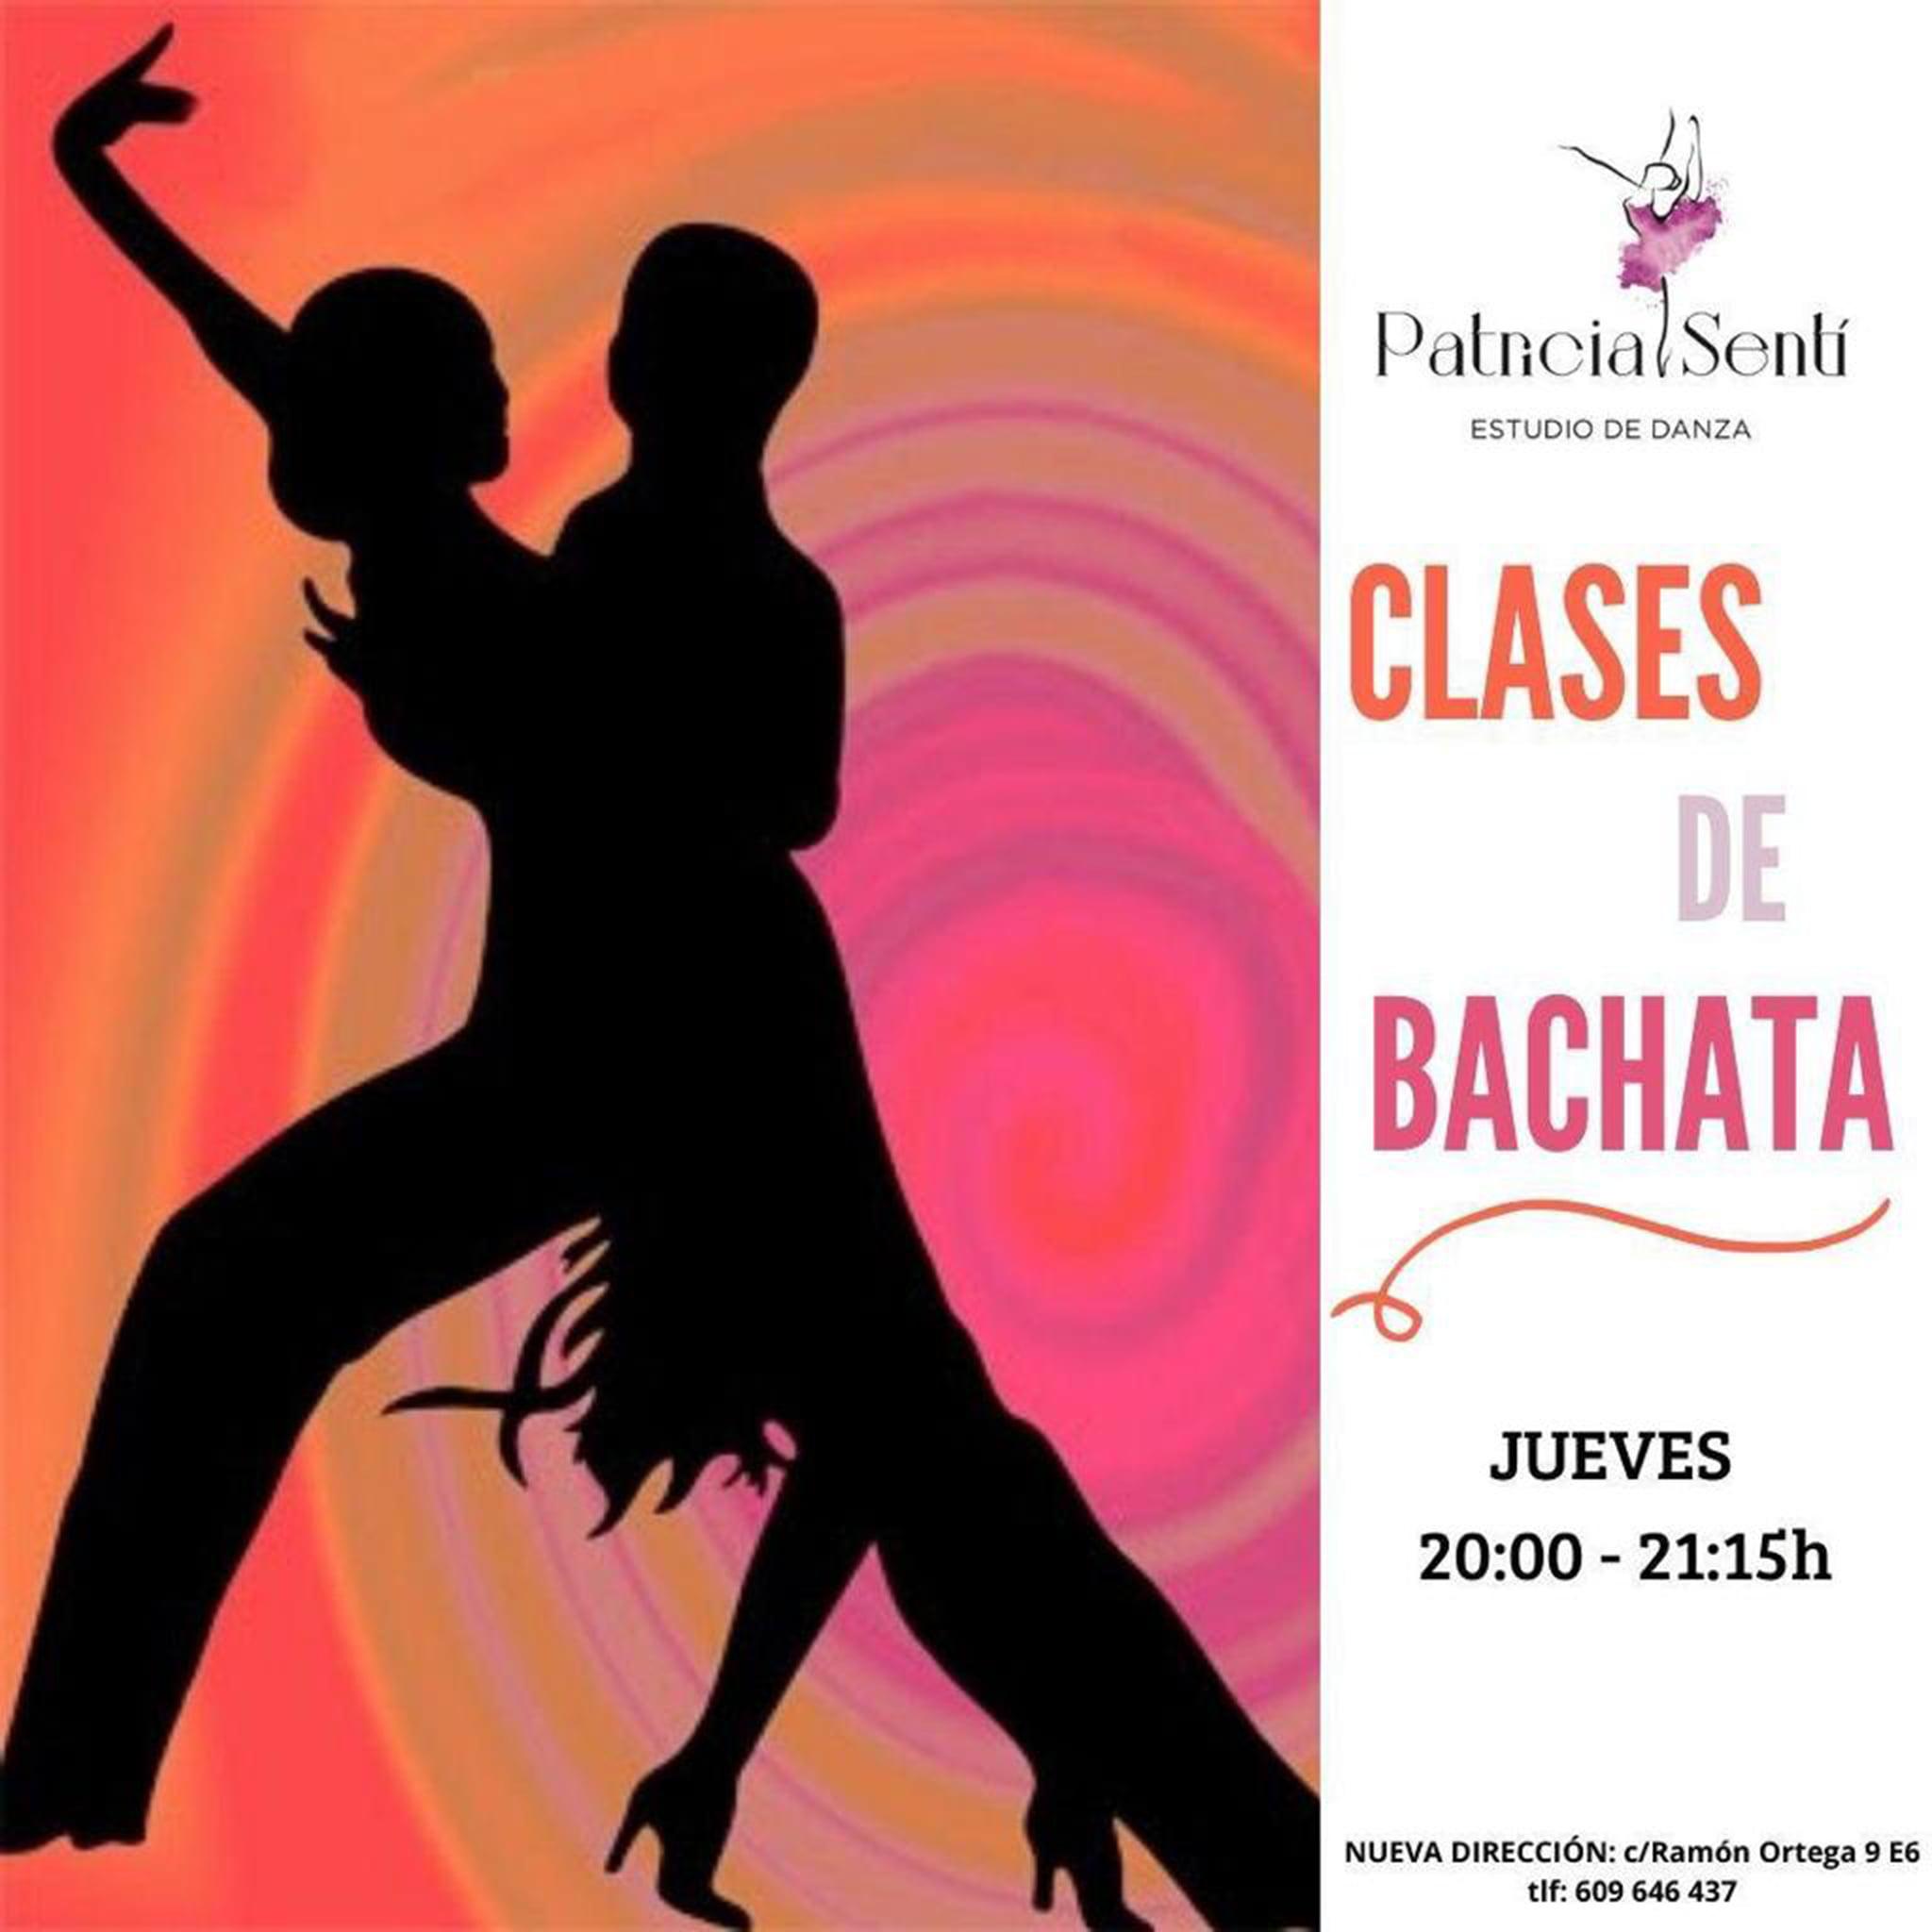 Bachata classes in Dénia - Patricia Sentí Dance Studio